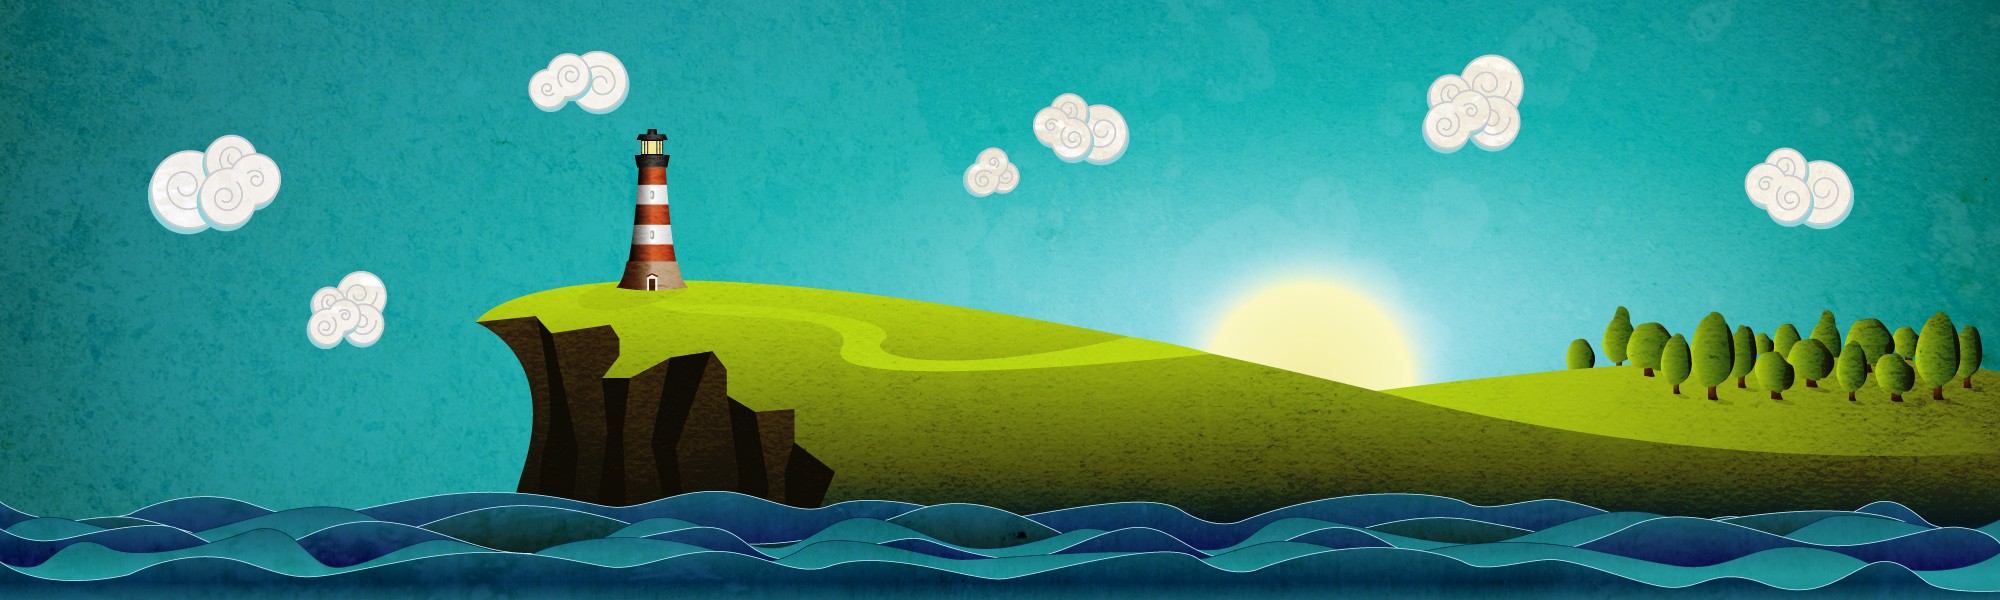 How To Design A Picturesque Coastal Landscape Using Illustrator And Photoshop Aviatstudios Com,John F Kennedy Junior Young